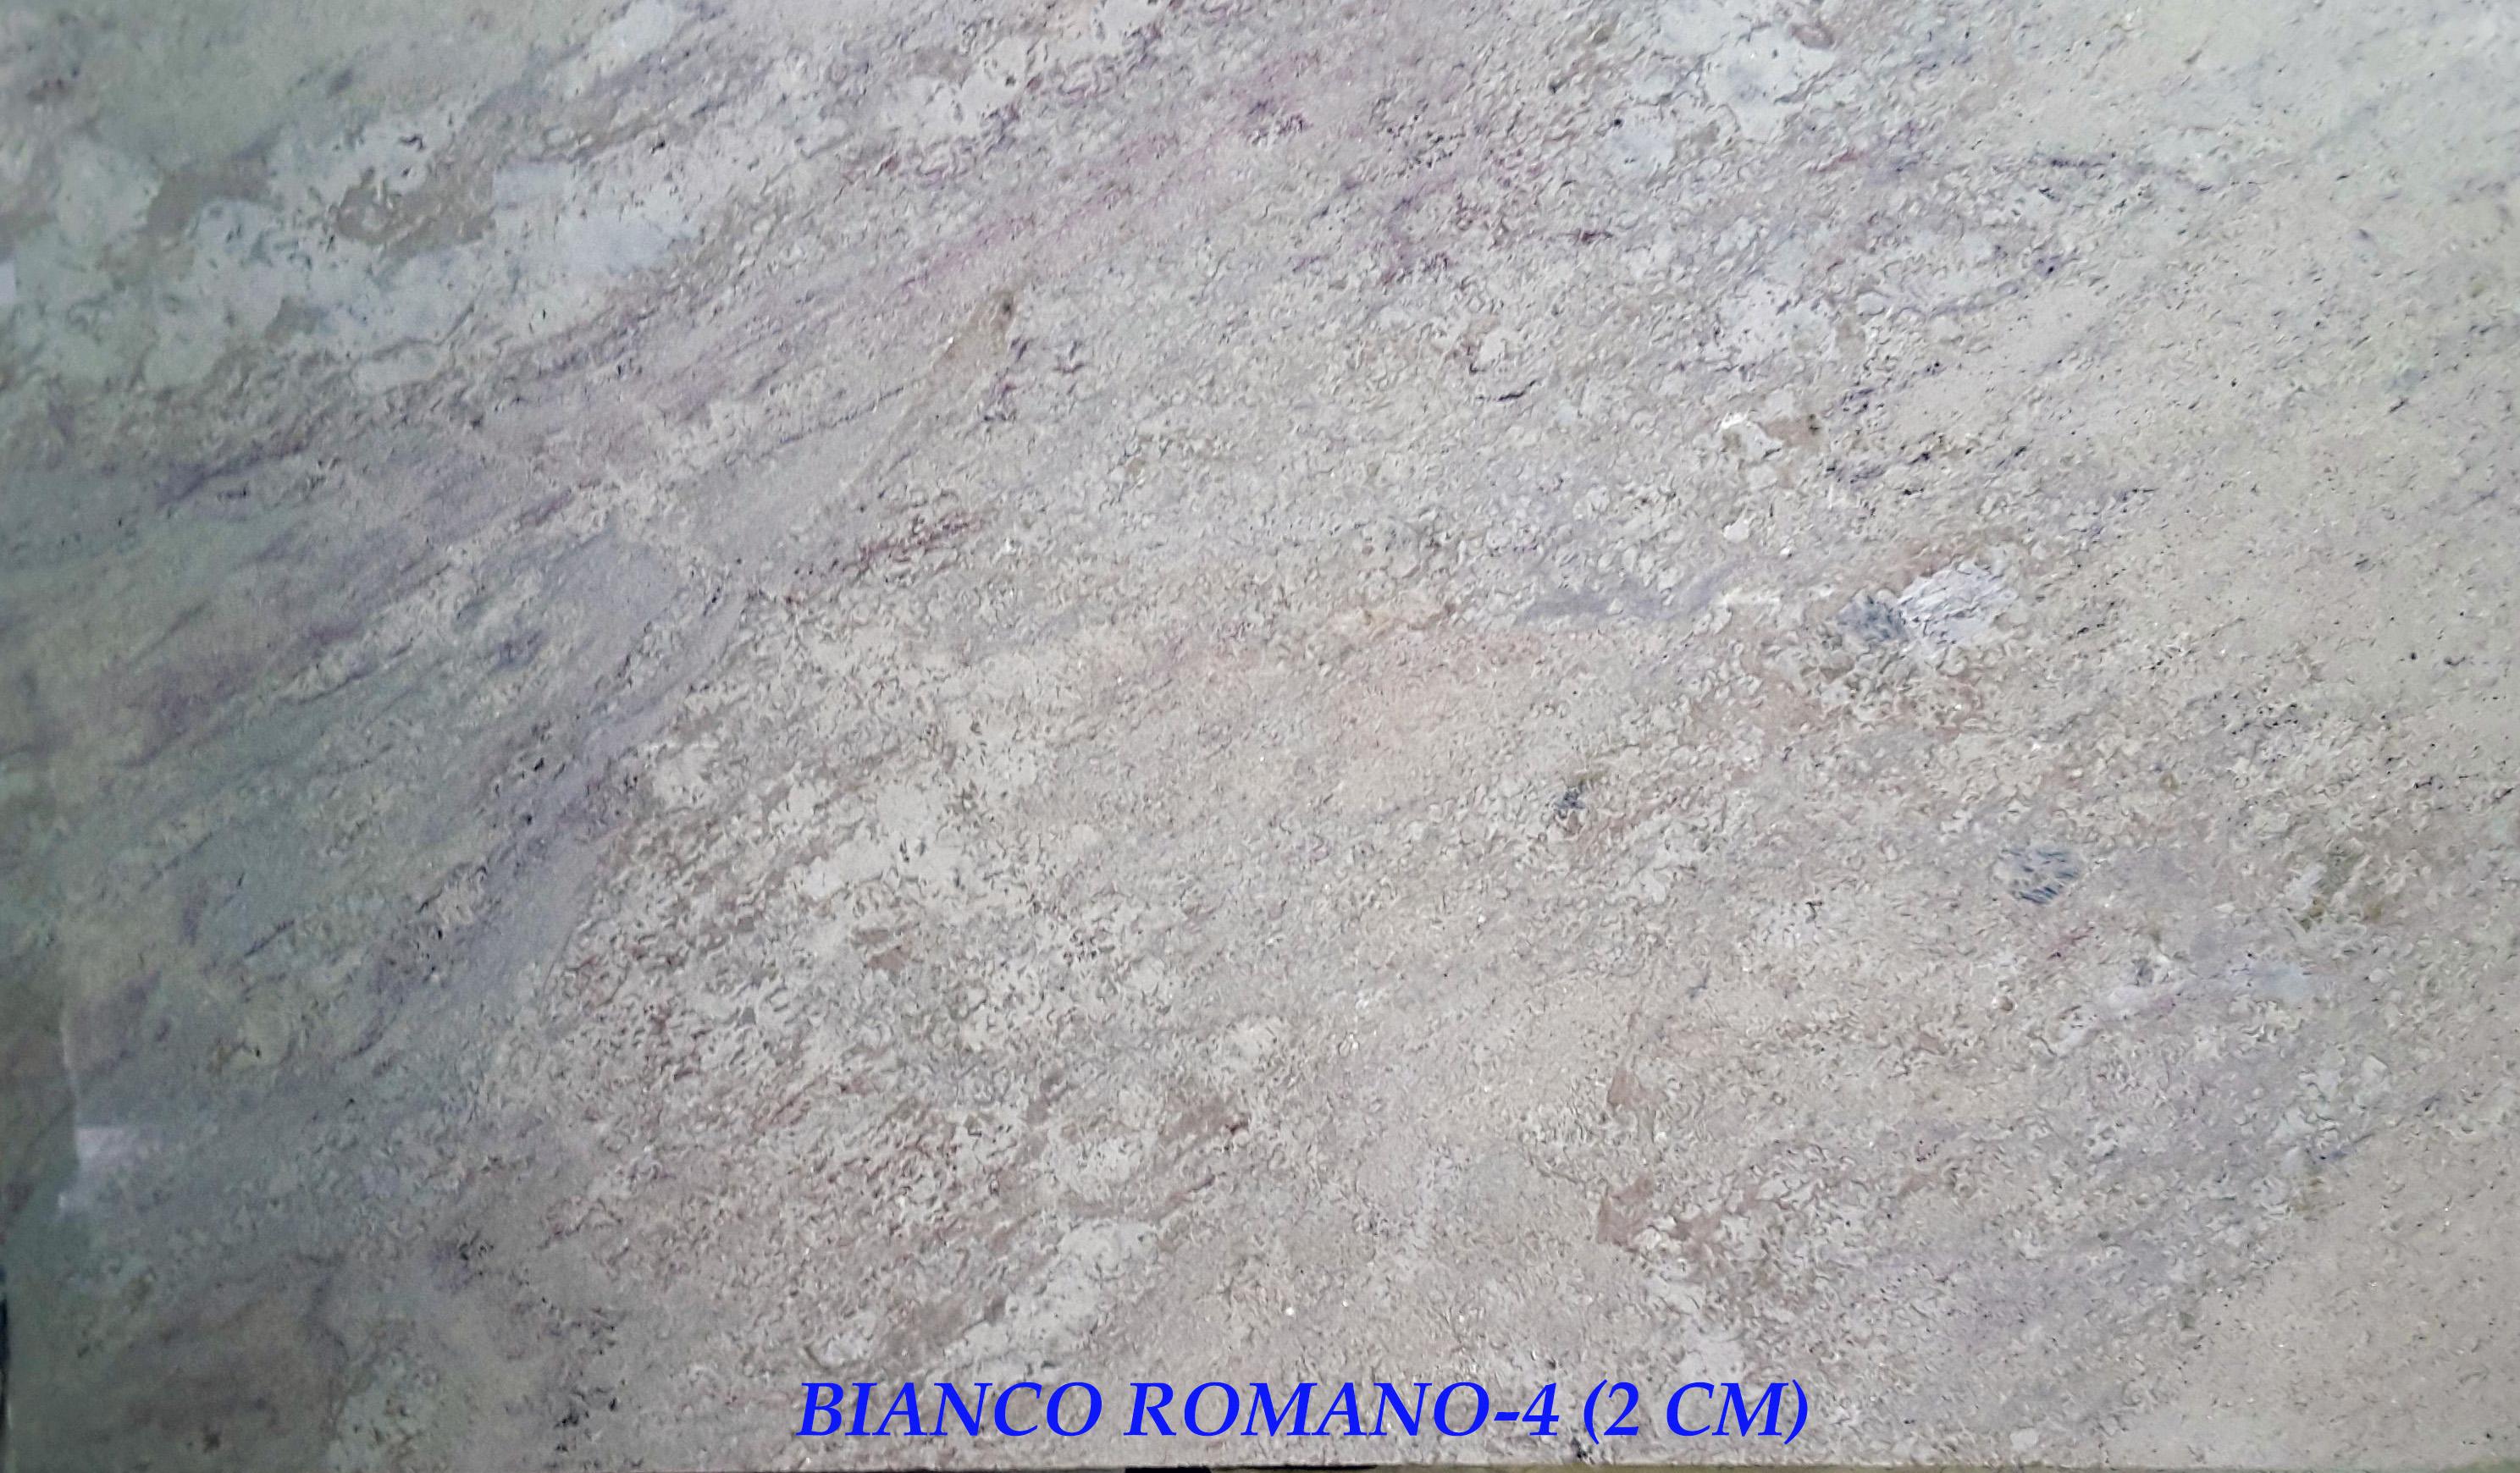 BIANCO ROMANO-4 (2 CM)-#7594